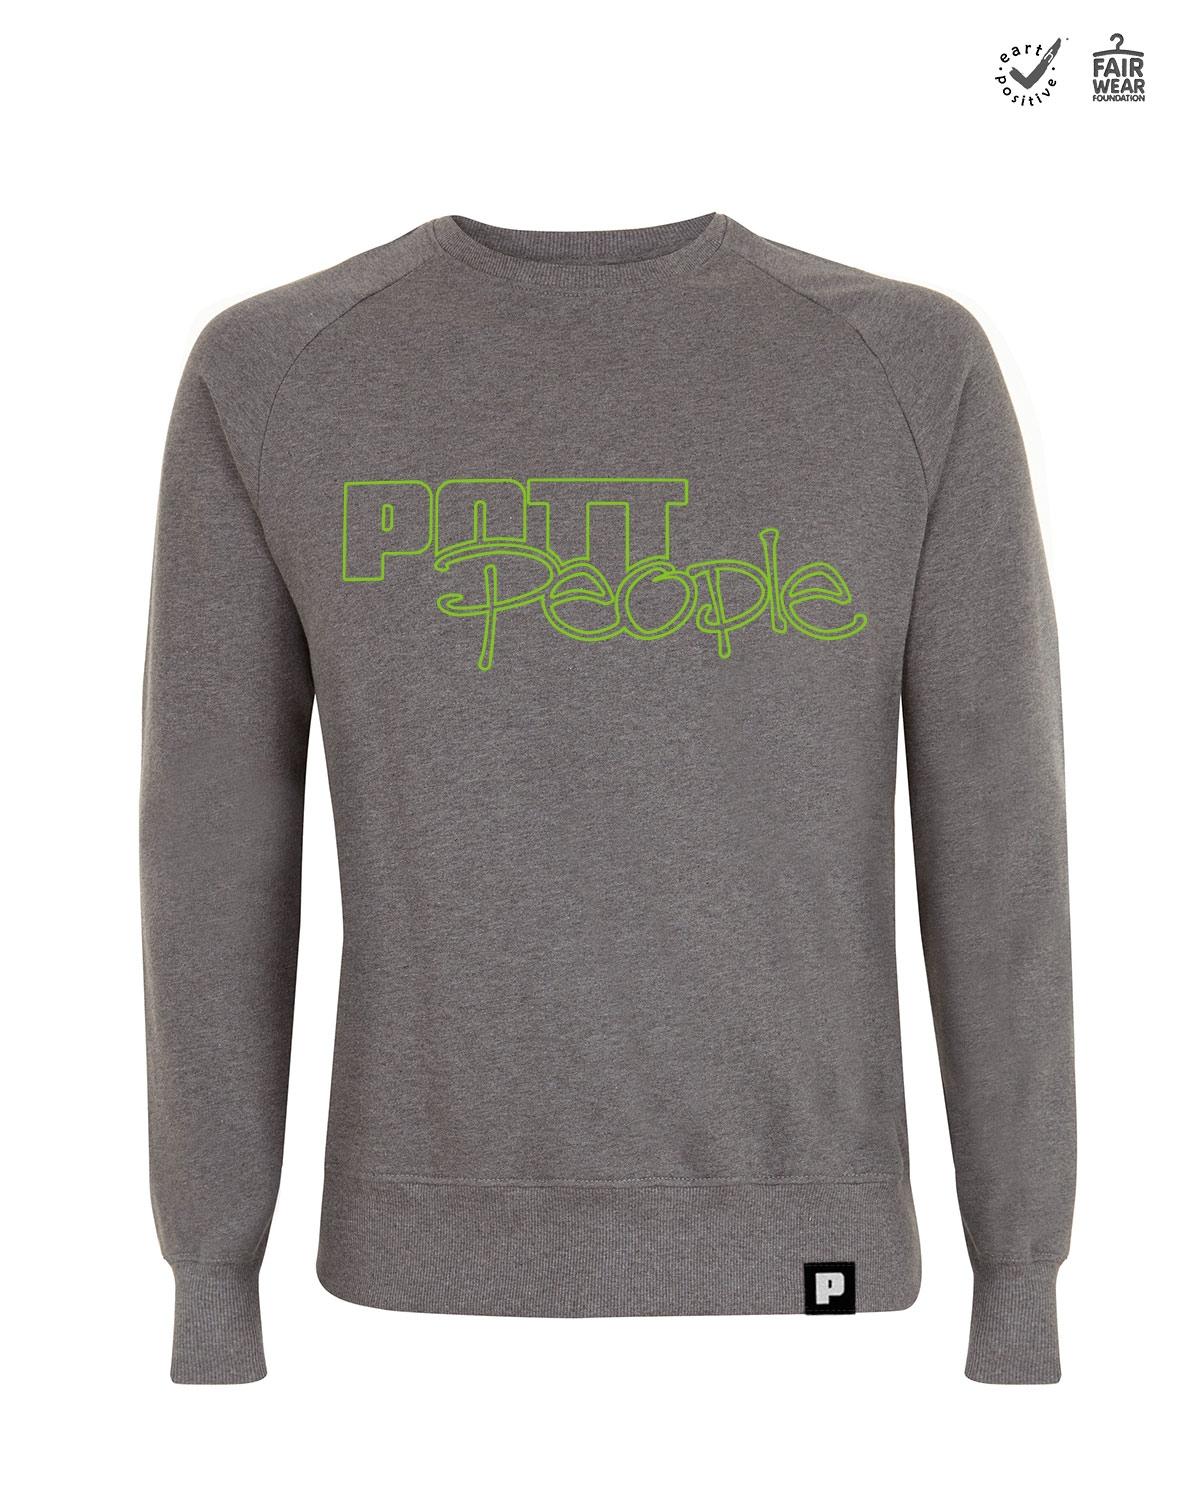 Sweatshirt Herren Dunkelgrau/Grün